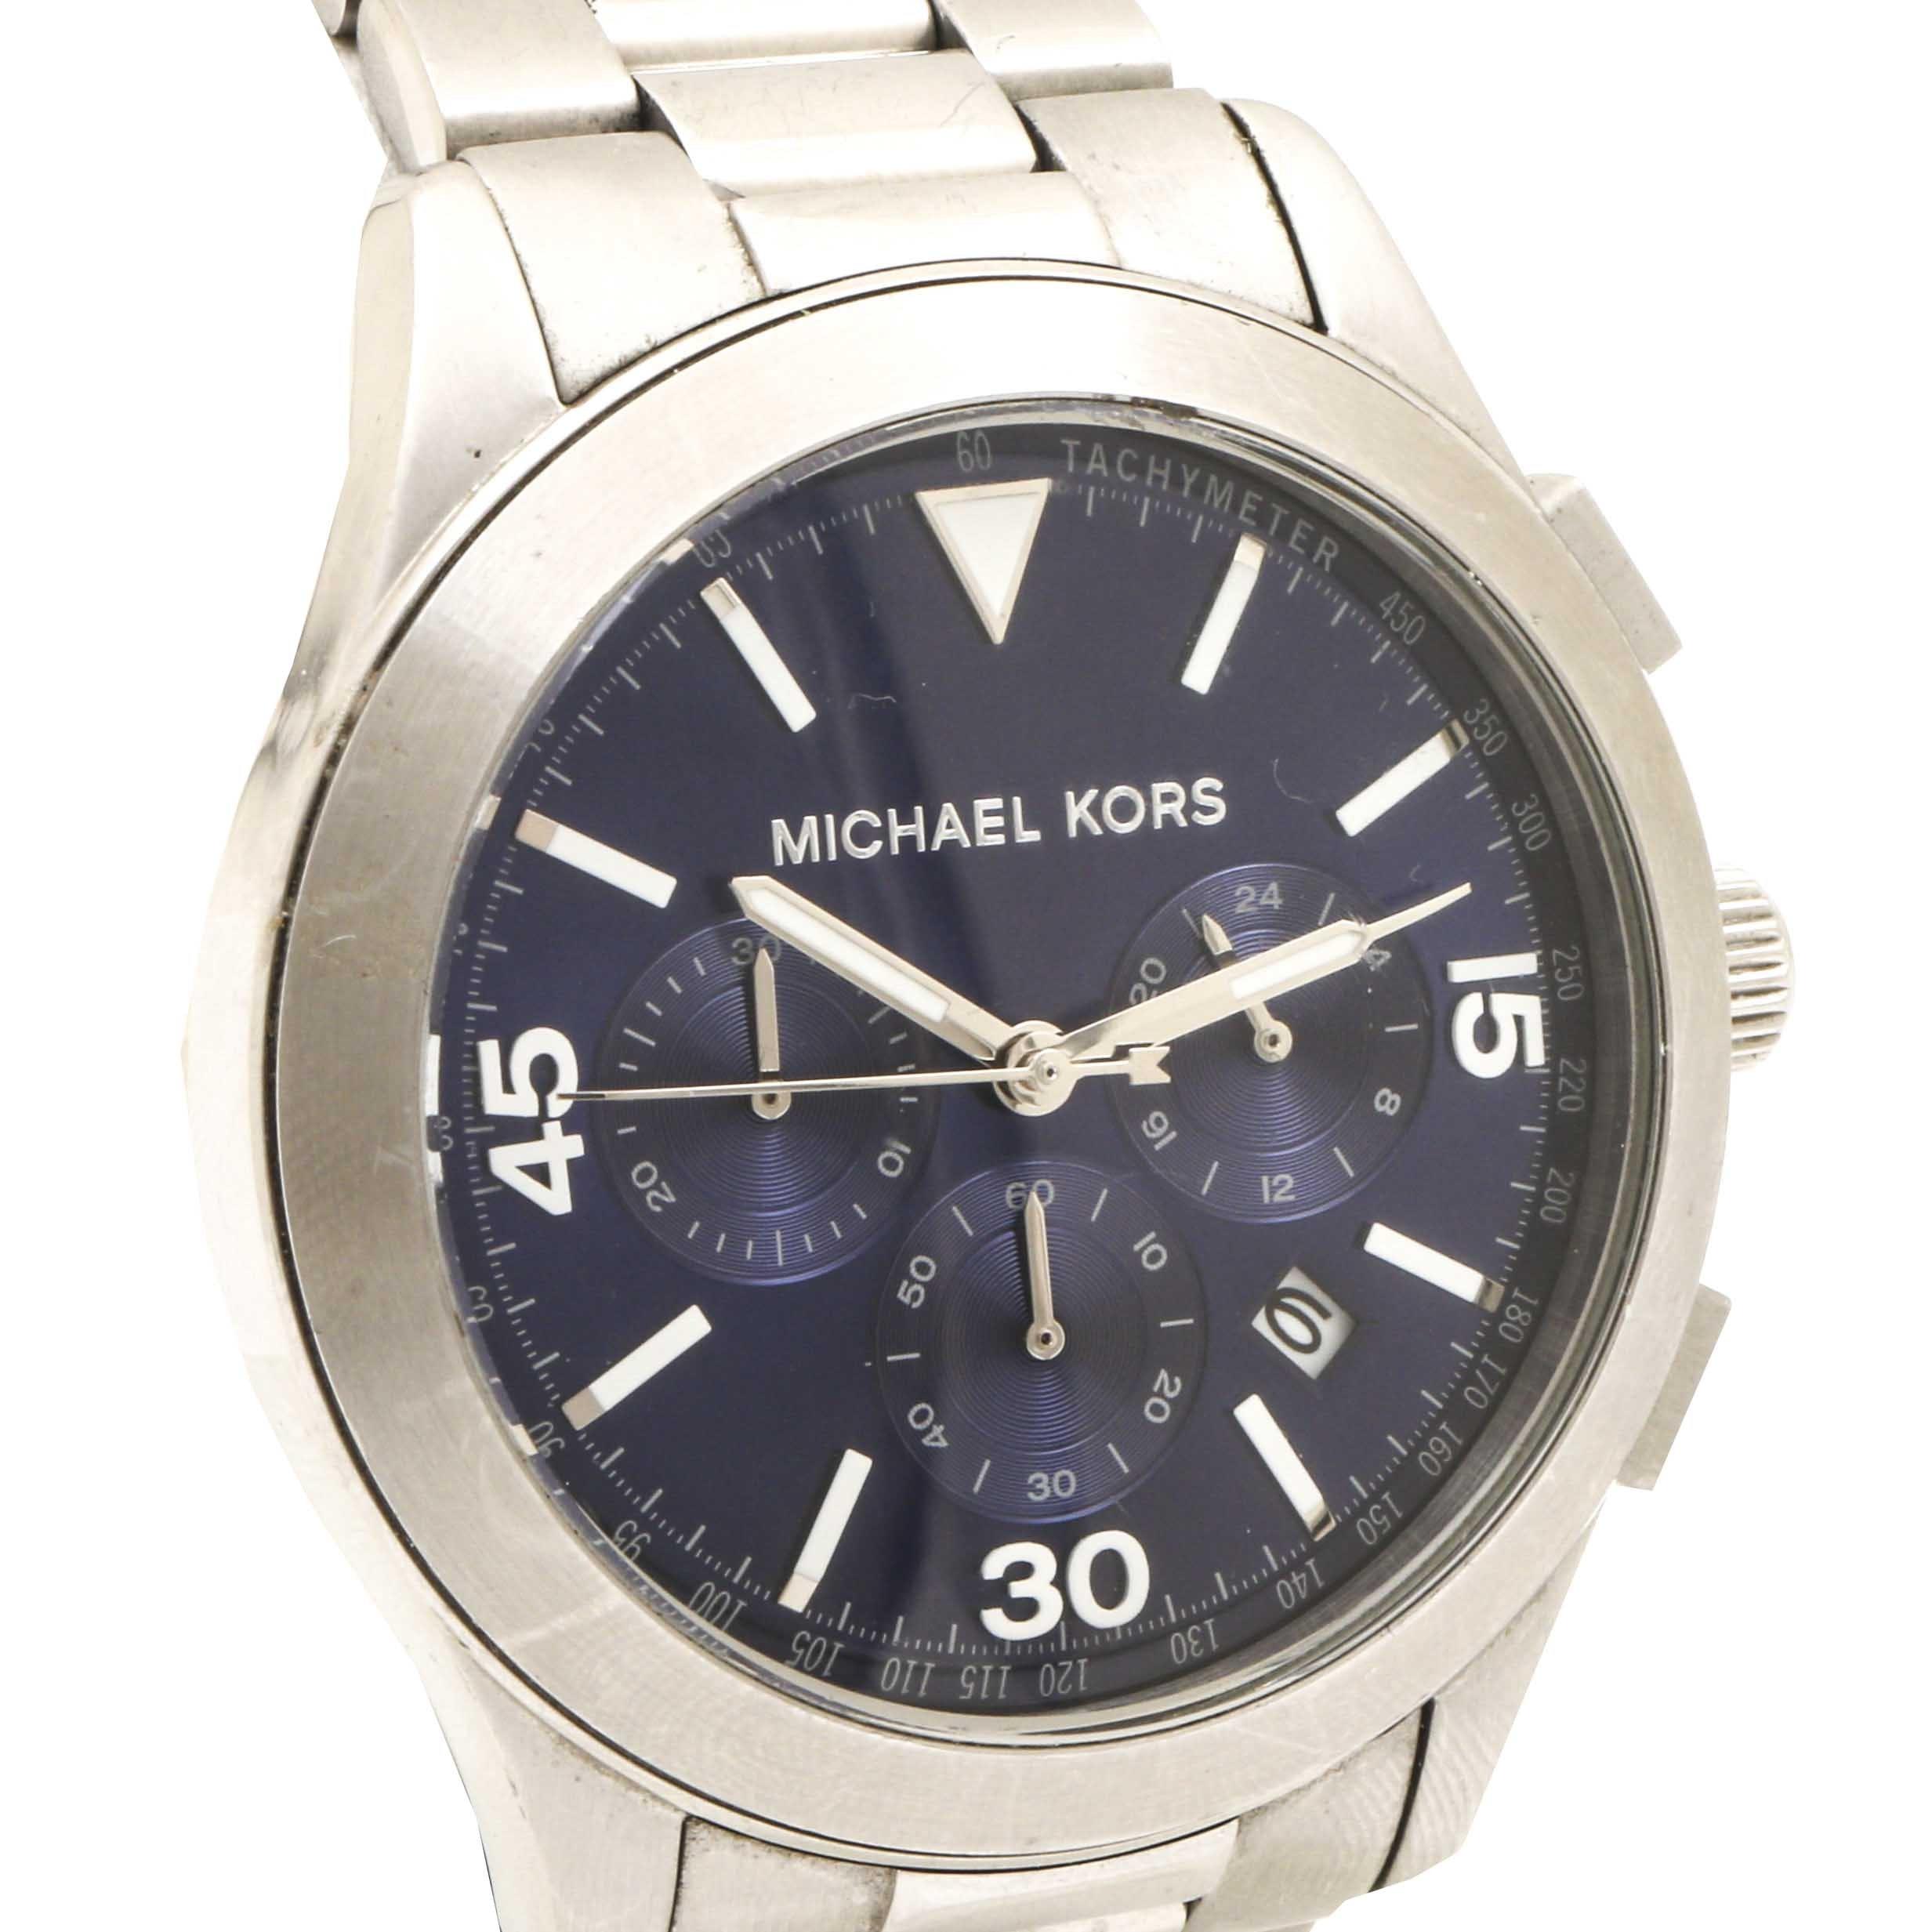 Michael Kors Stainless Steel Quartz Wristwatch